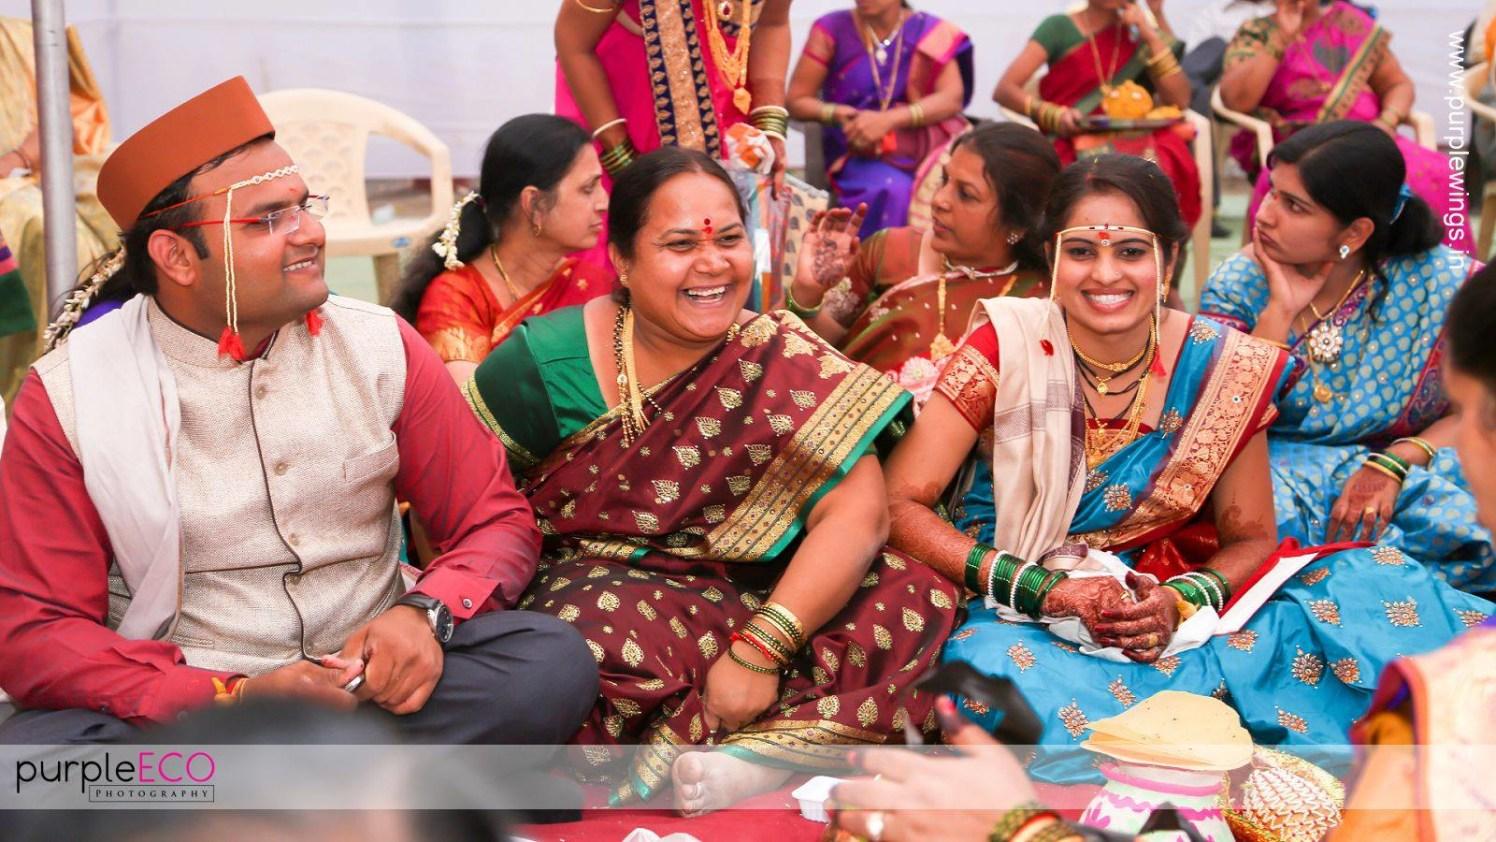 Good spirits by purpleECO photography Wedding-photography | Weddings Photos & Ideas